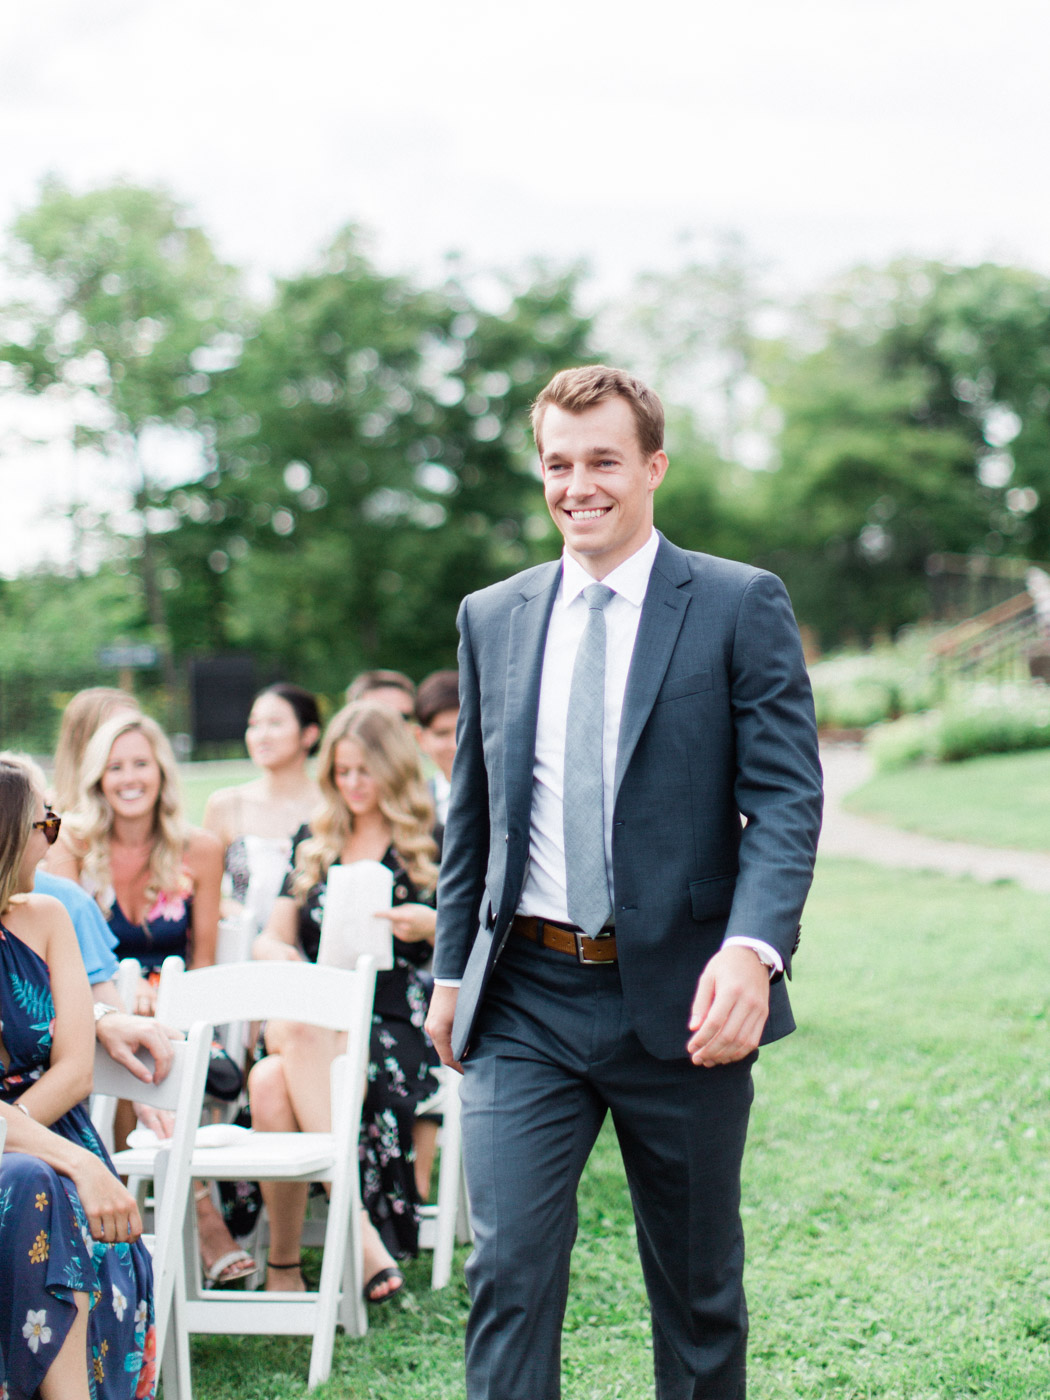 Toronto-Muskoka-wedding-photographer-summery-fun-documentary-the-marriott-rosseau71.jpg